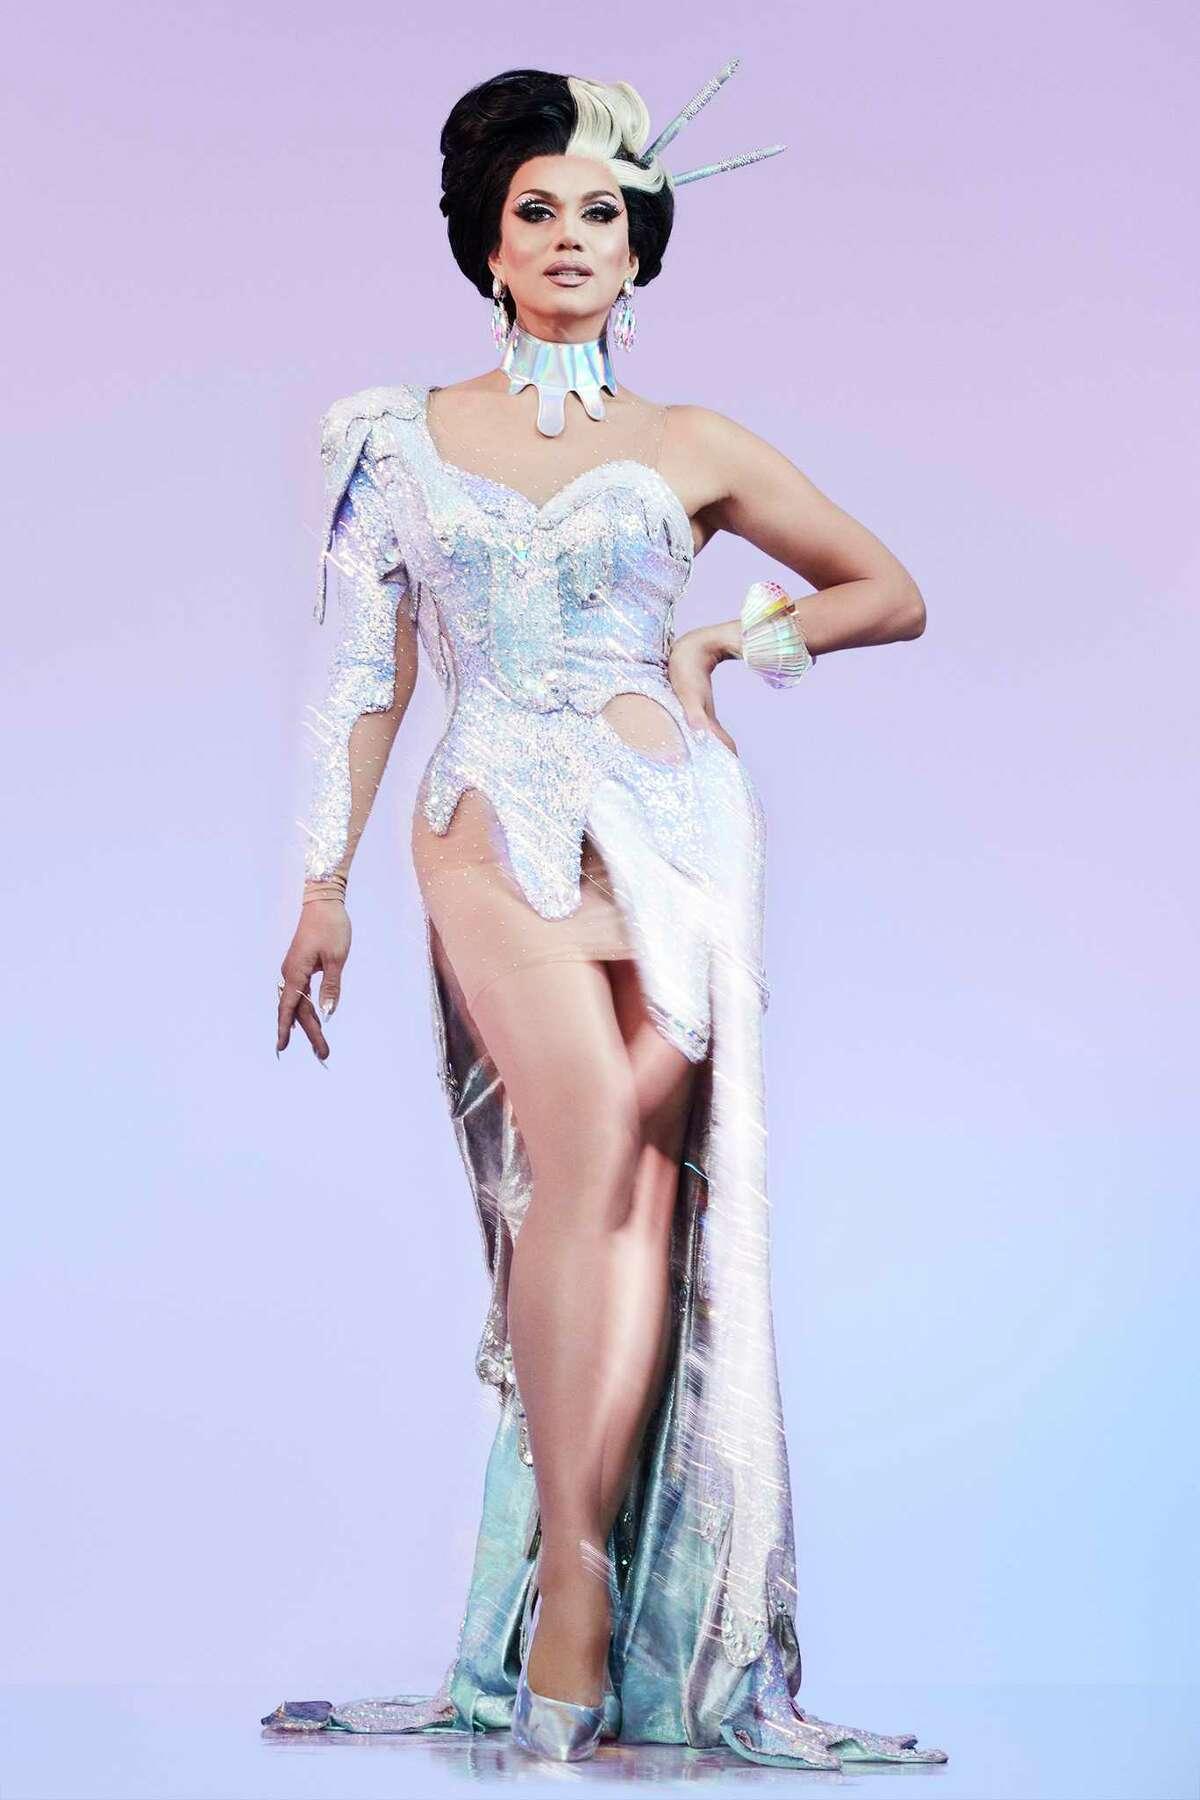 RuPaul's Drag Race All Stars Season 4 cast. MANILA LUZON Eliminated Feb. 1